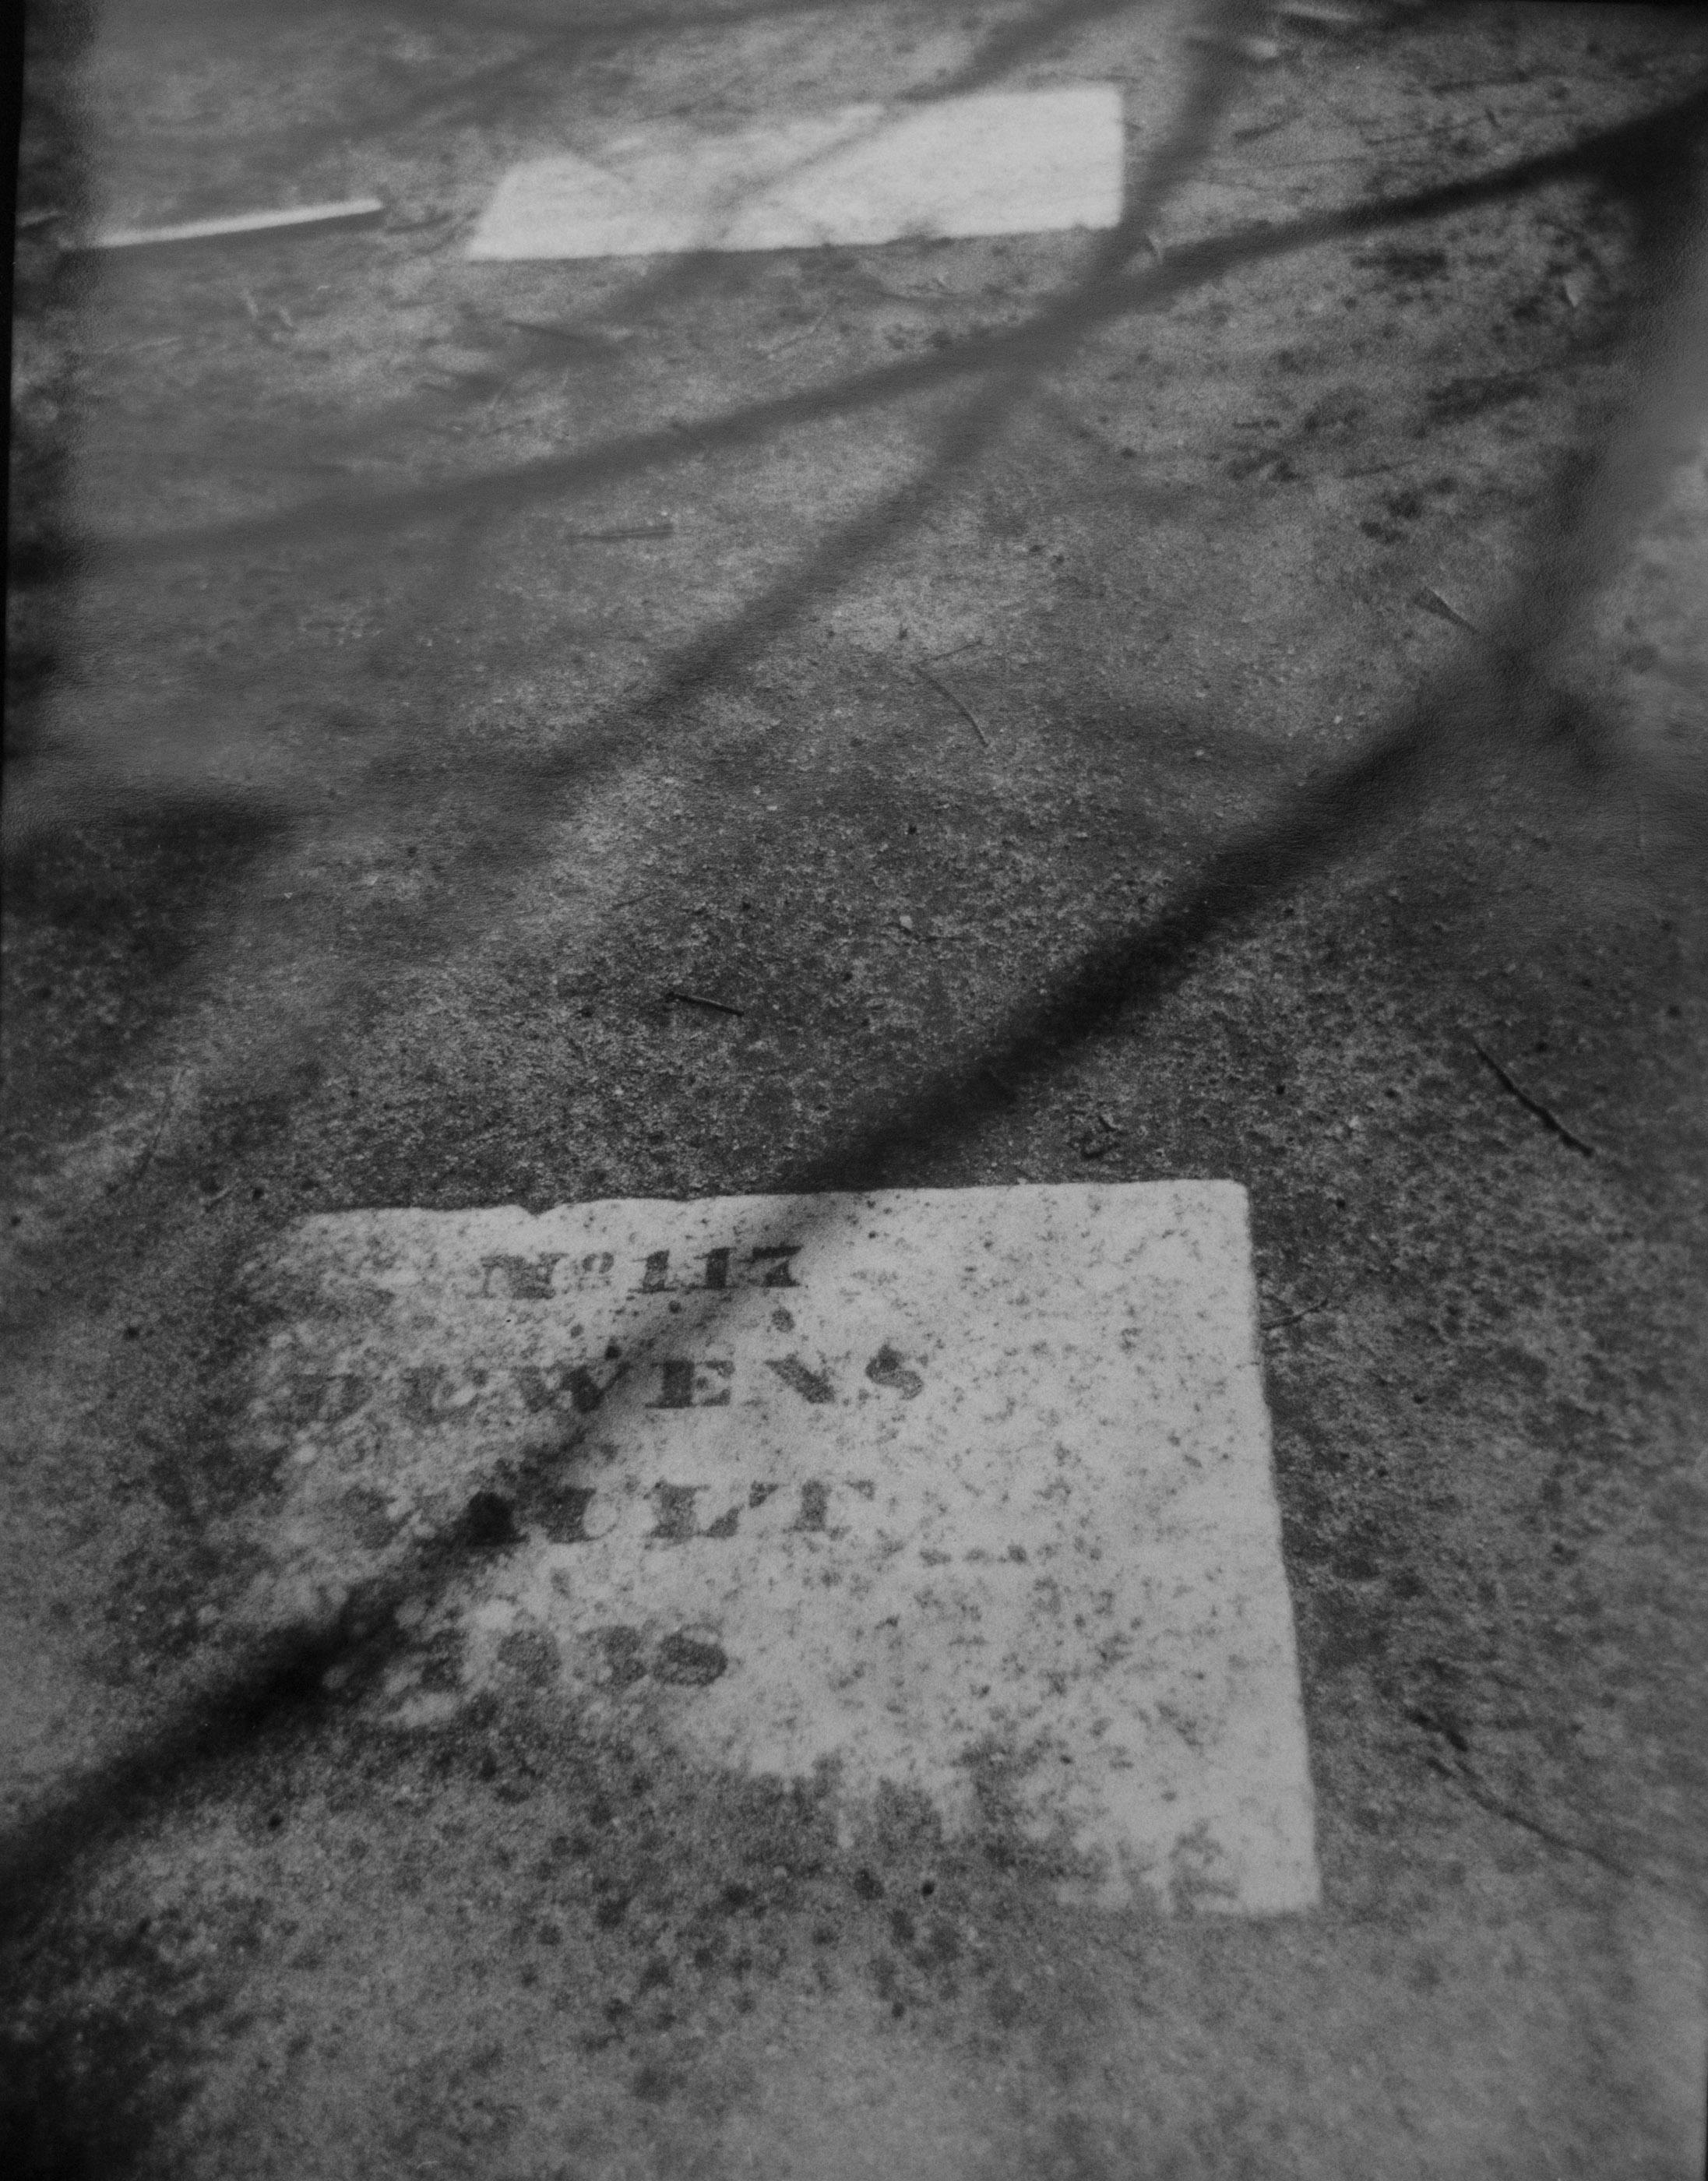 17_Grave Ground_St. Mark's Church-in-the-Bowerie, 1999-2000_.jpg